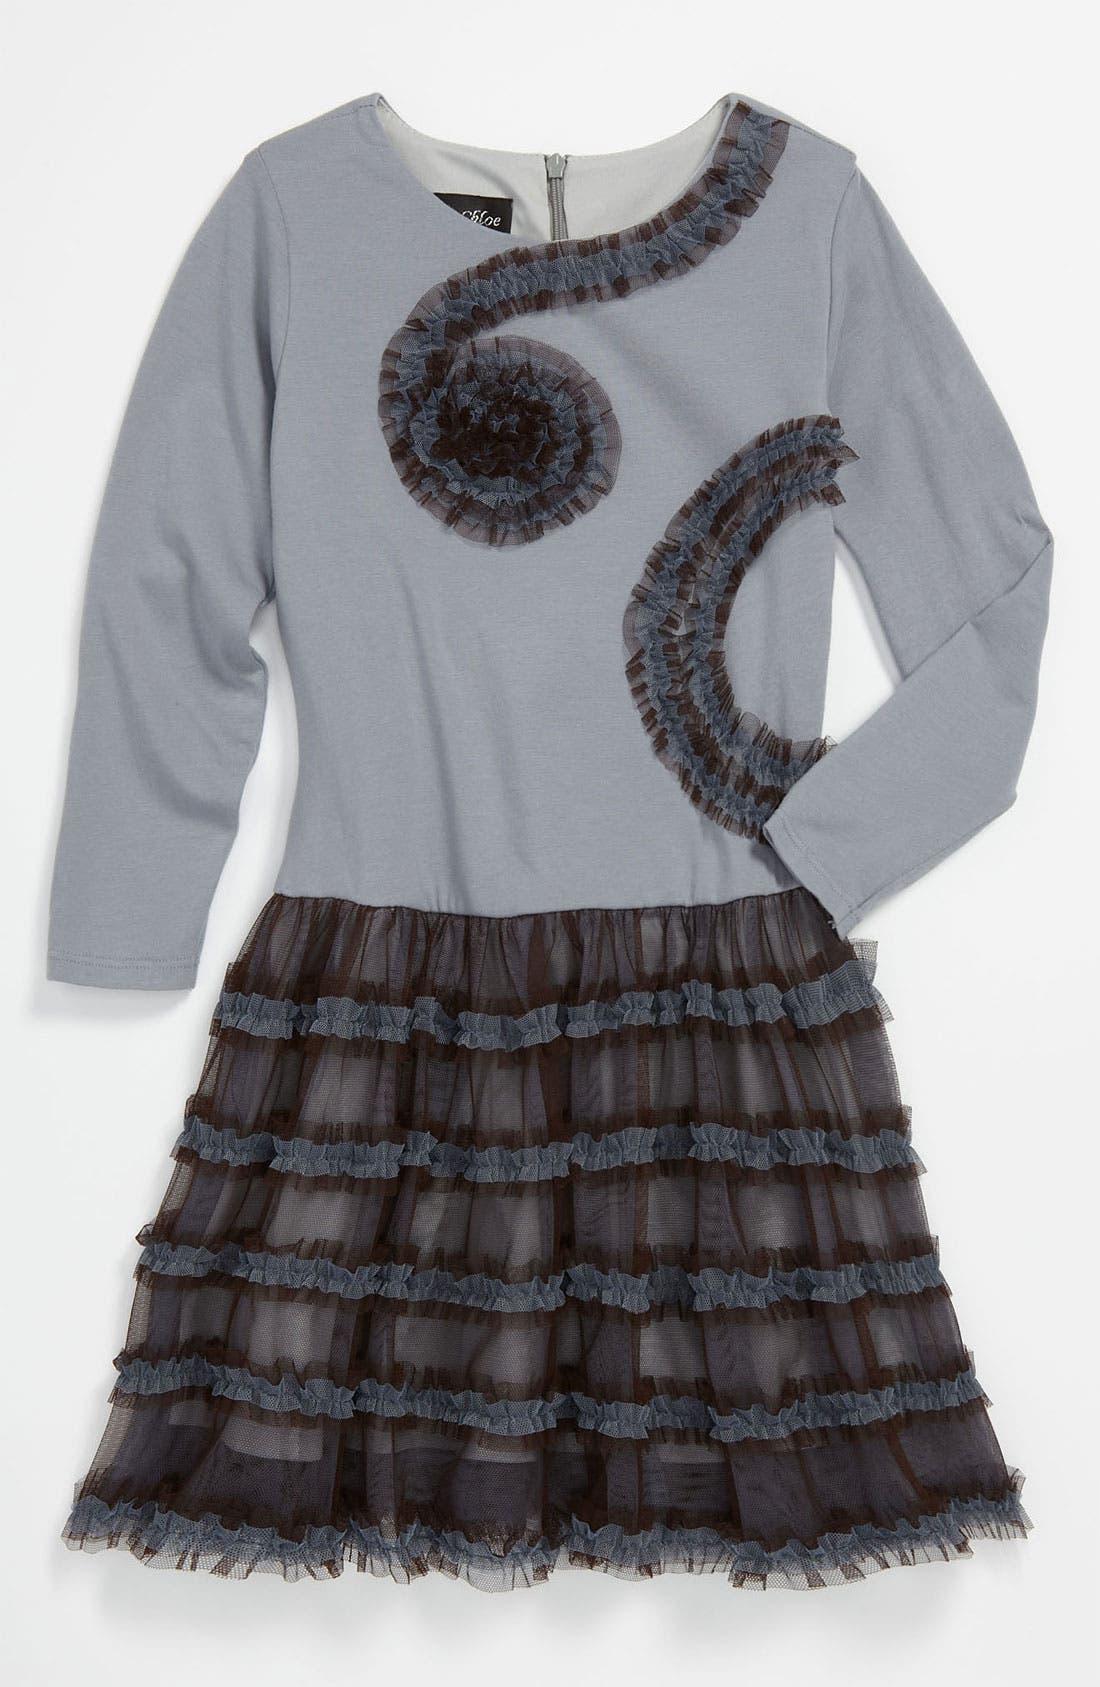 Alternate Image 1 Selected - Isobella & Chloe 'Blue Moon' Mesh Ruffle Dress (Little Girls & Big Girls)